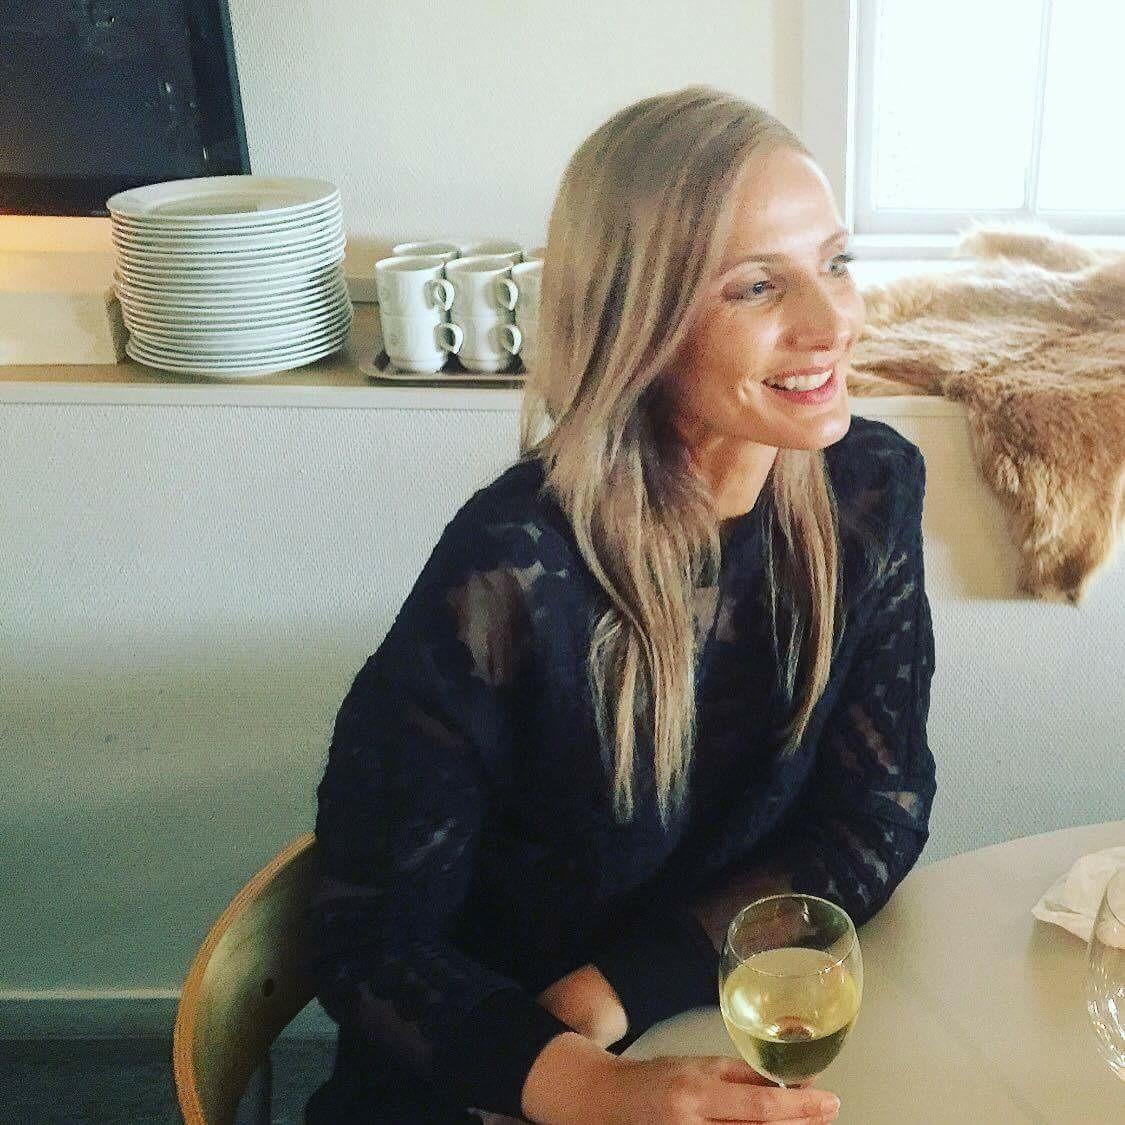 Fejø Vin, model